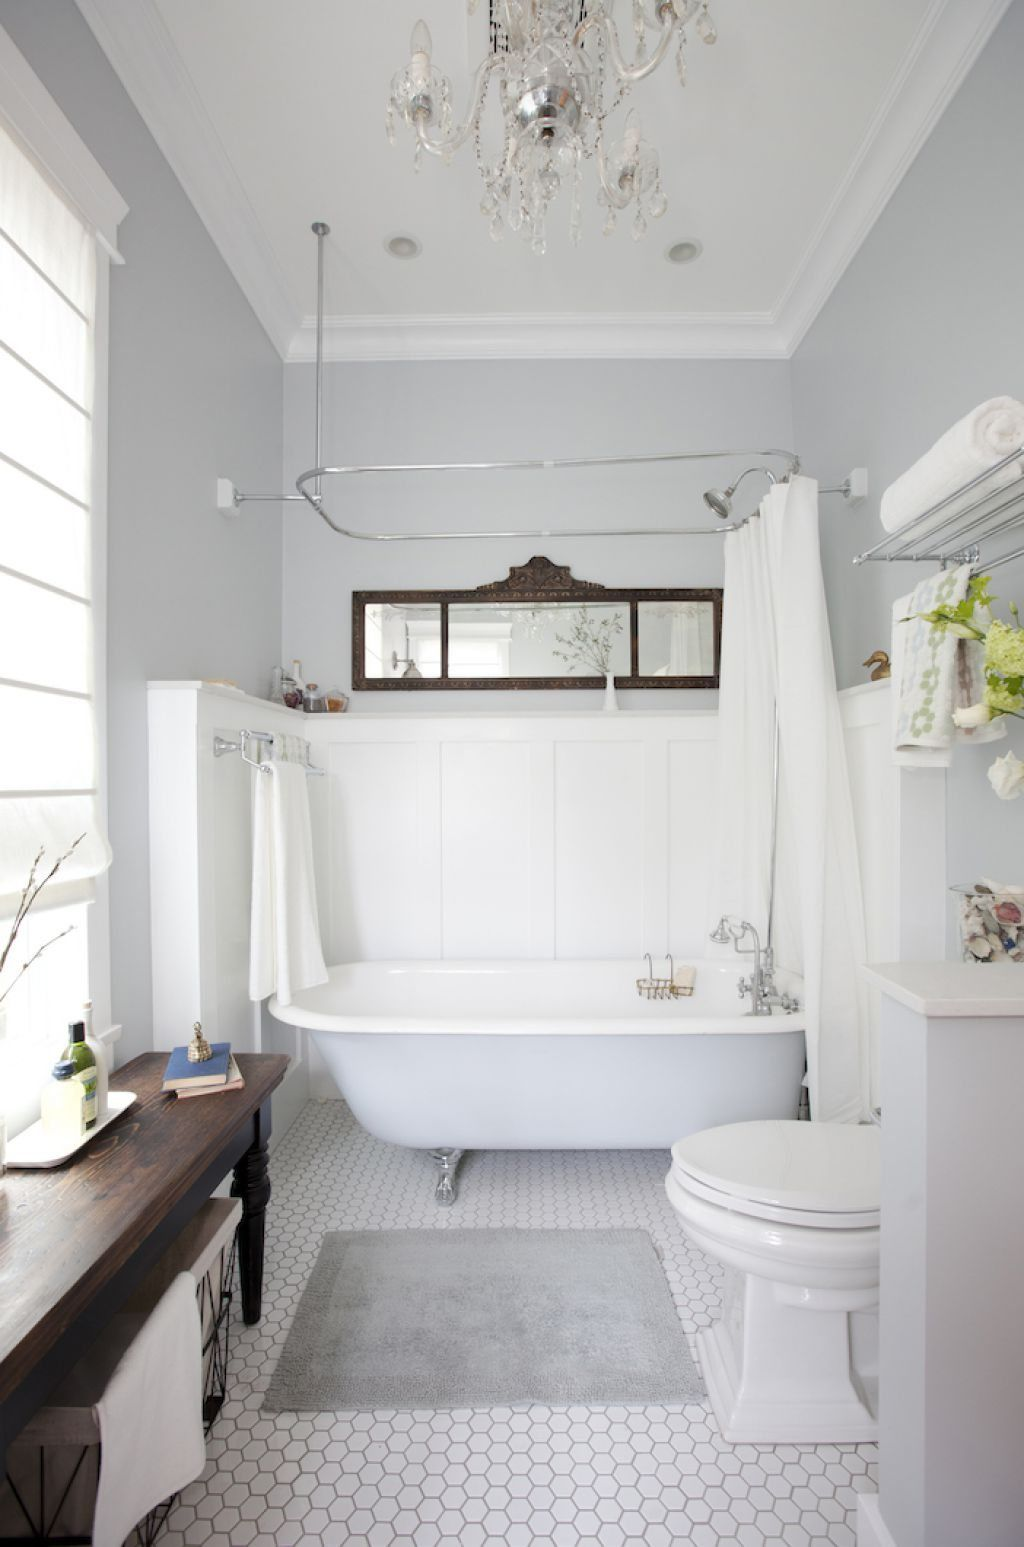 Chic Bathroom With Clawfoot Tub And Neutral Walls Also Wainscoting Amusing Bathroom With Clawfoot Tub Ideas Decorating Design